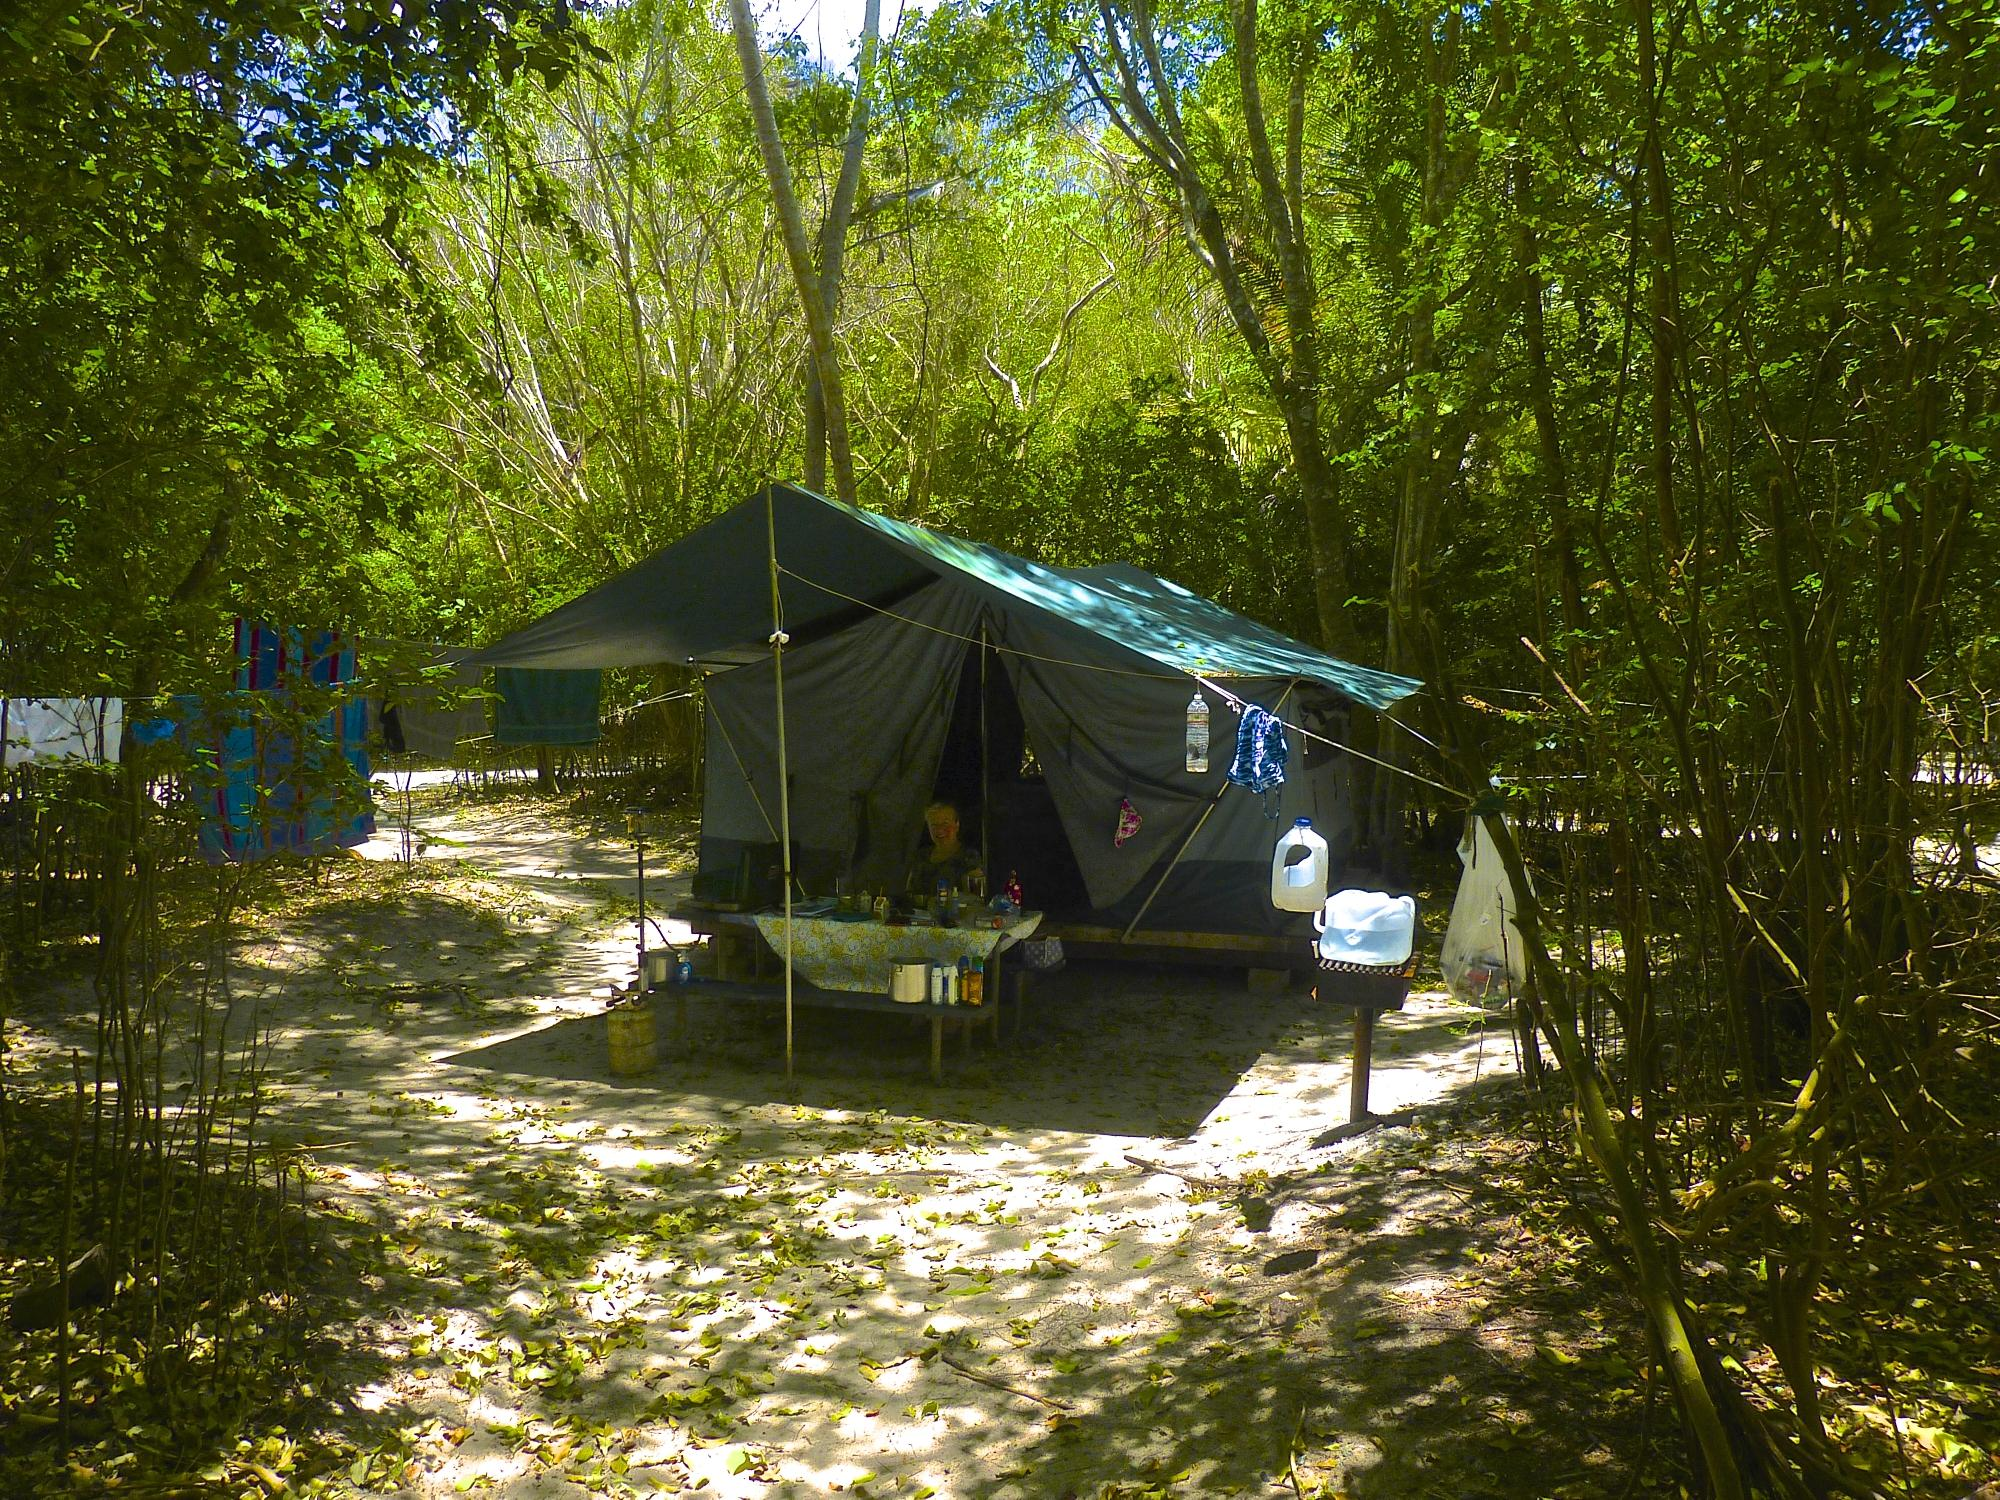 Cinnamon Bay Campground